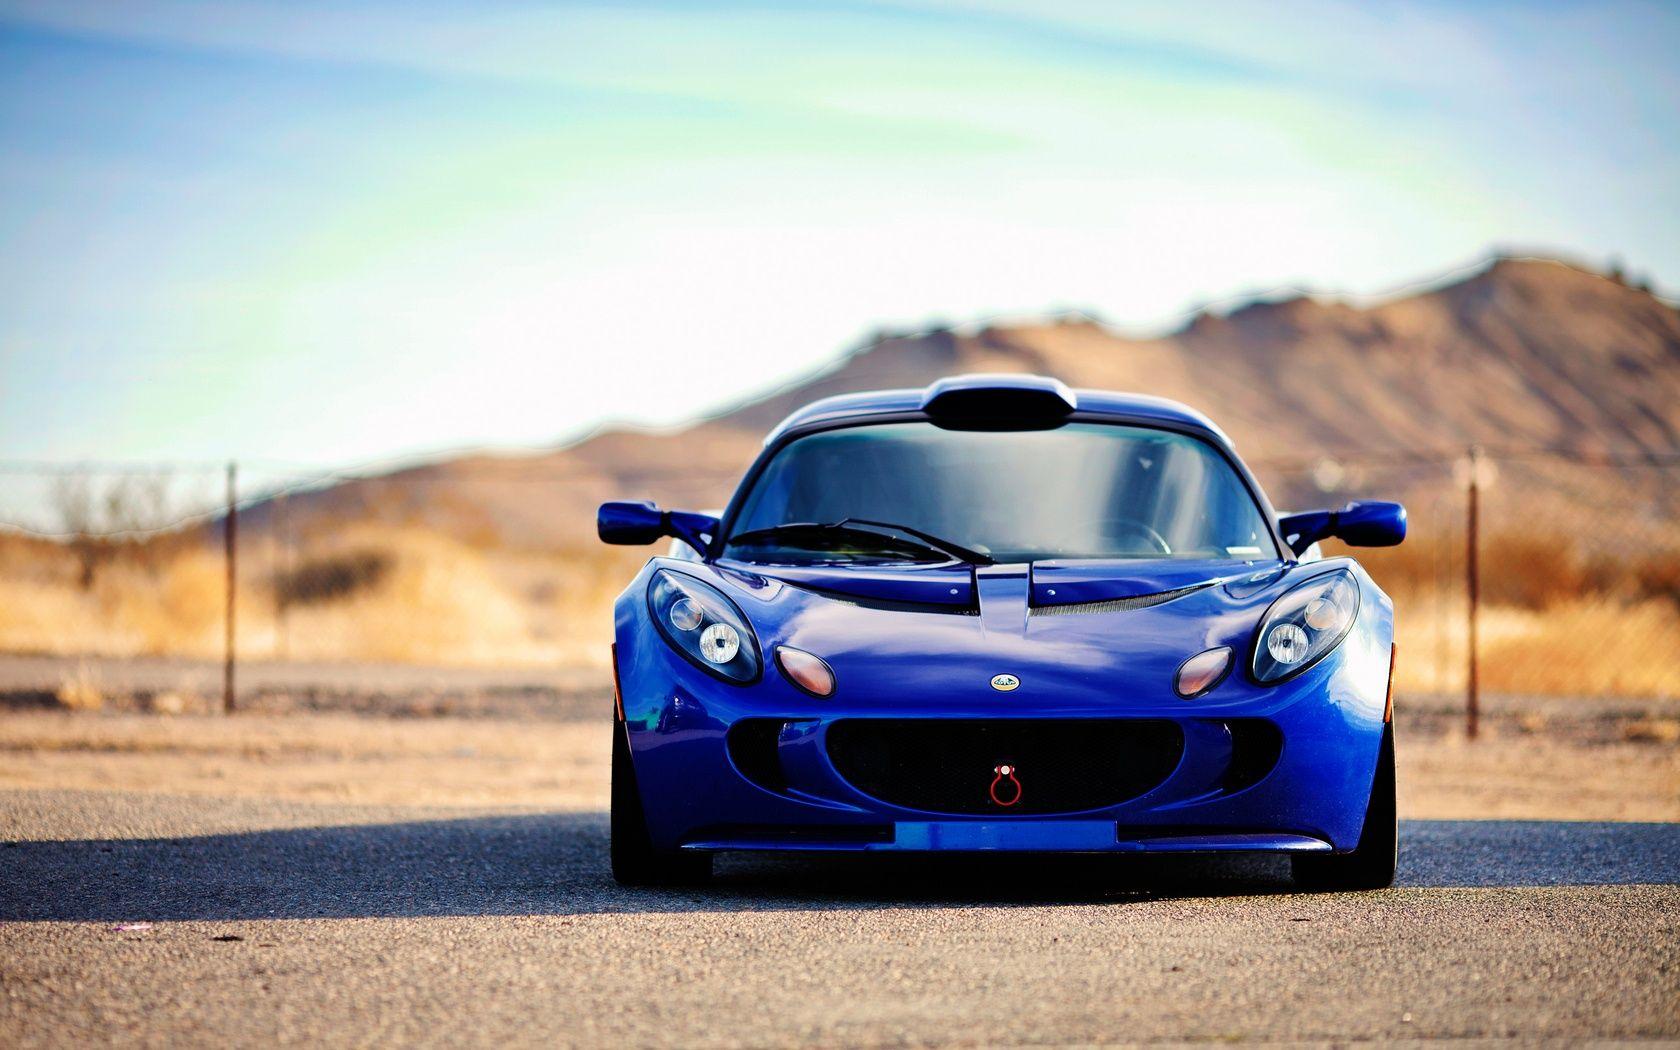 Blue Lotus Lotus sports car, Lotus exige, Sport cars